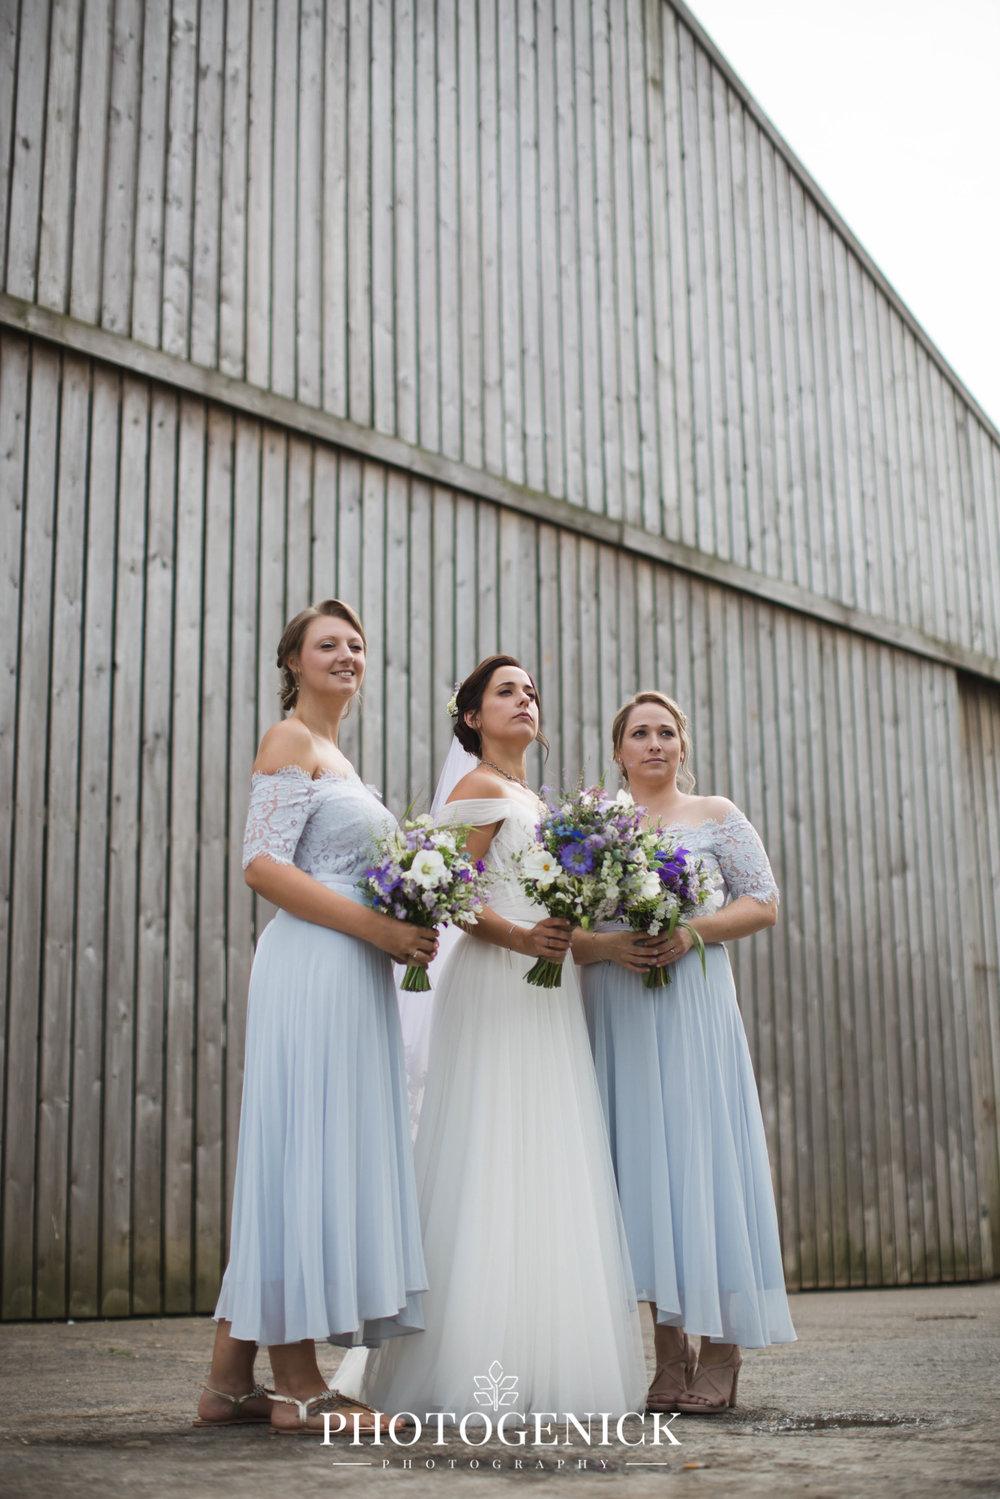 oldwalls gower wedding photographers-38.jpg